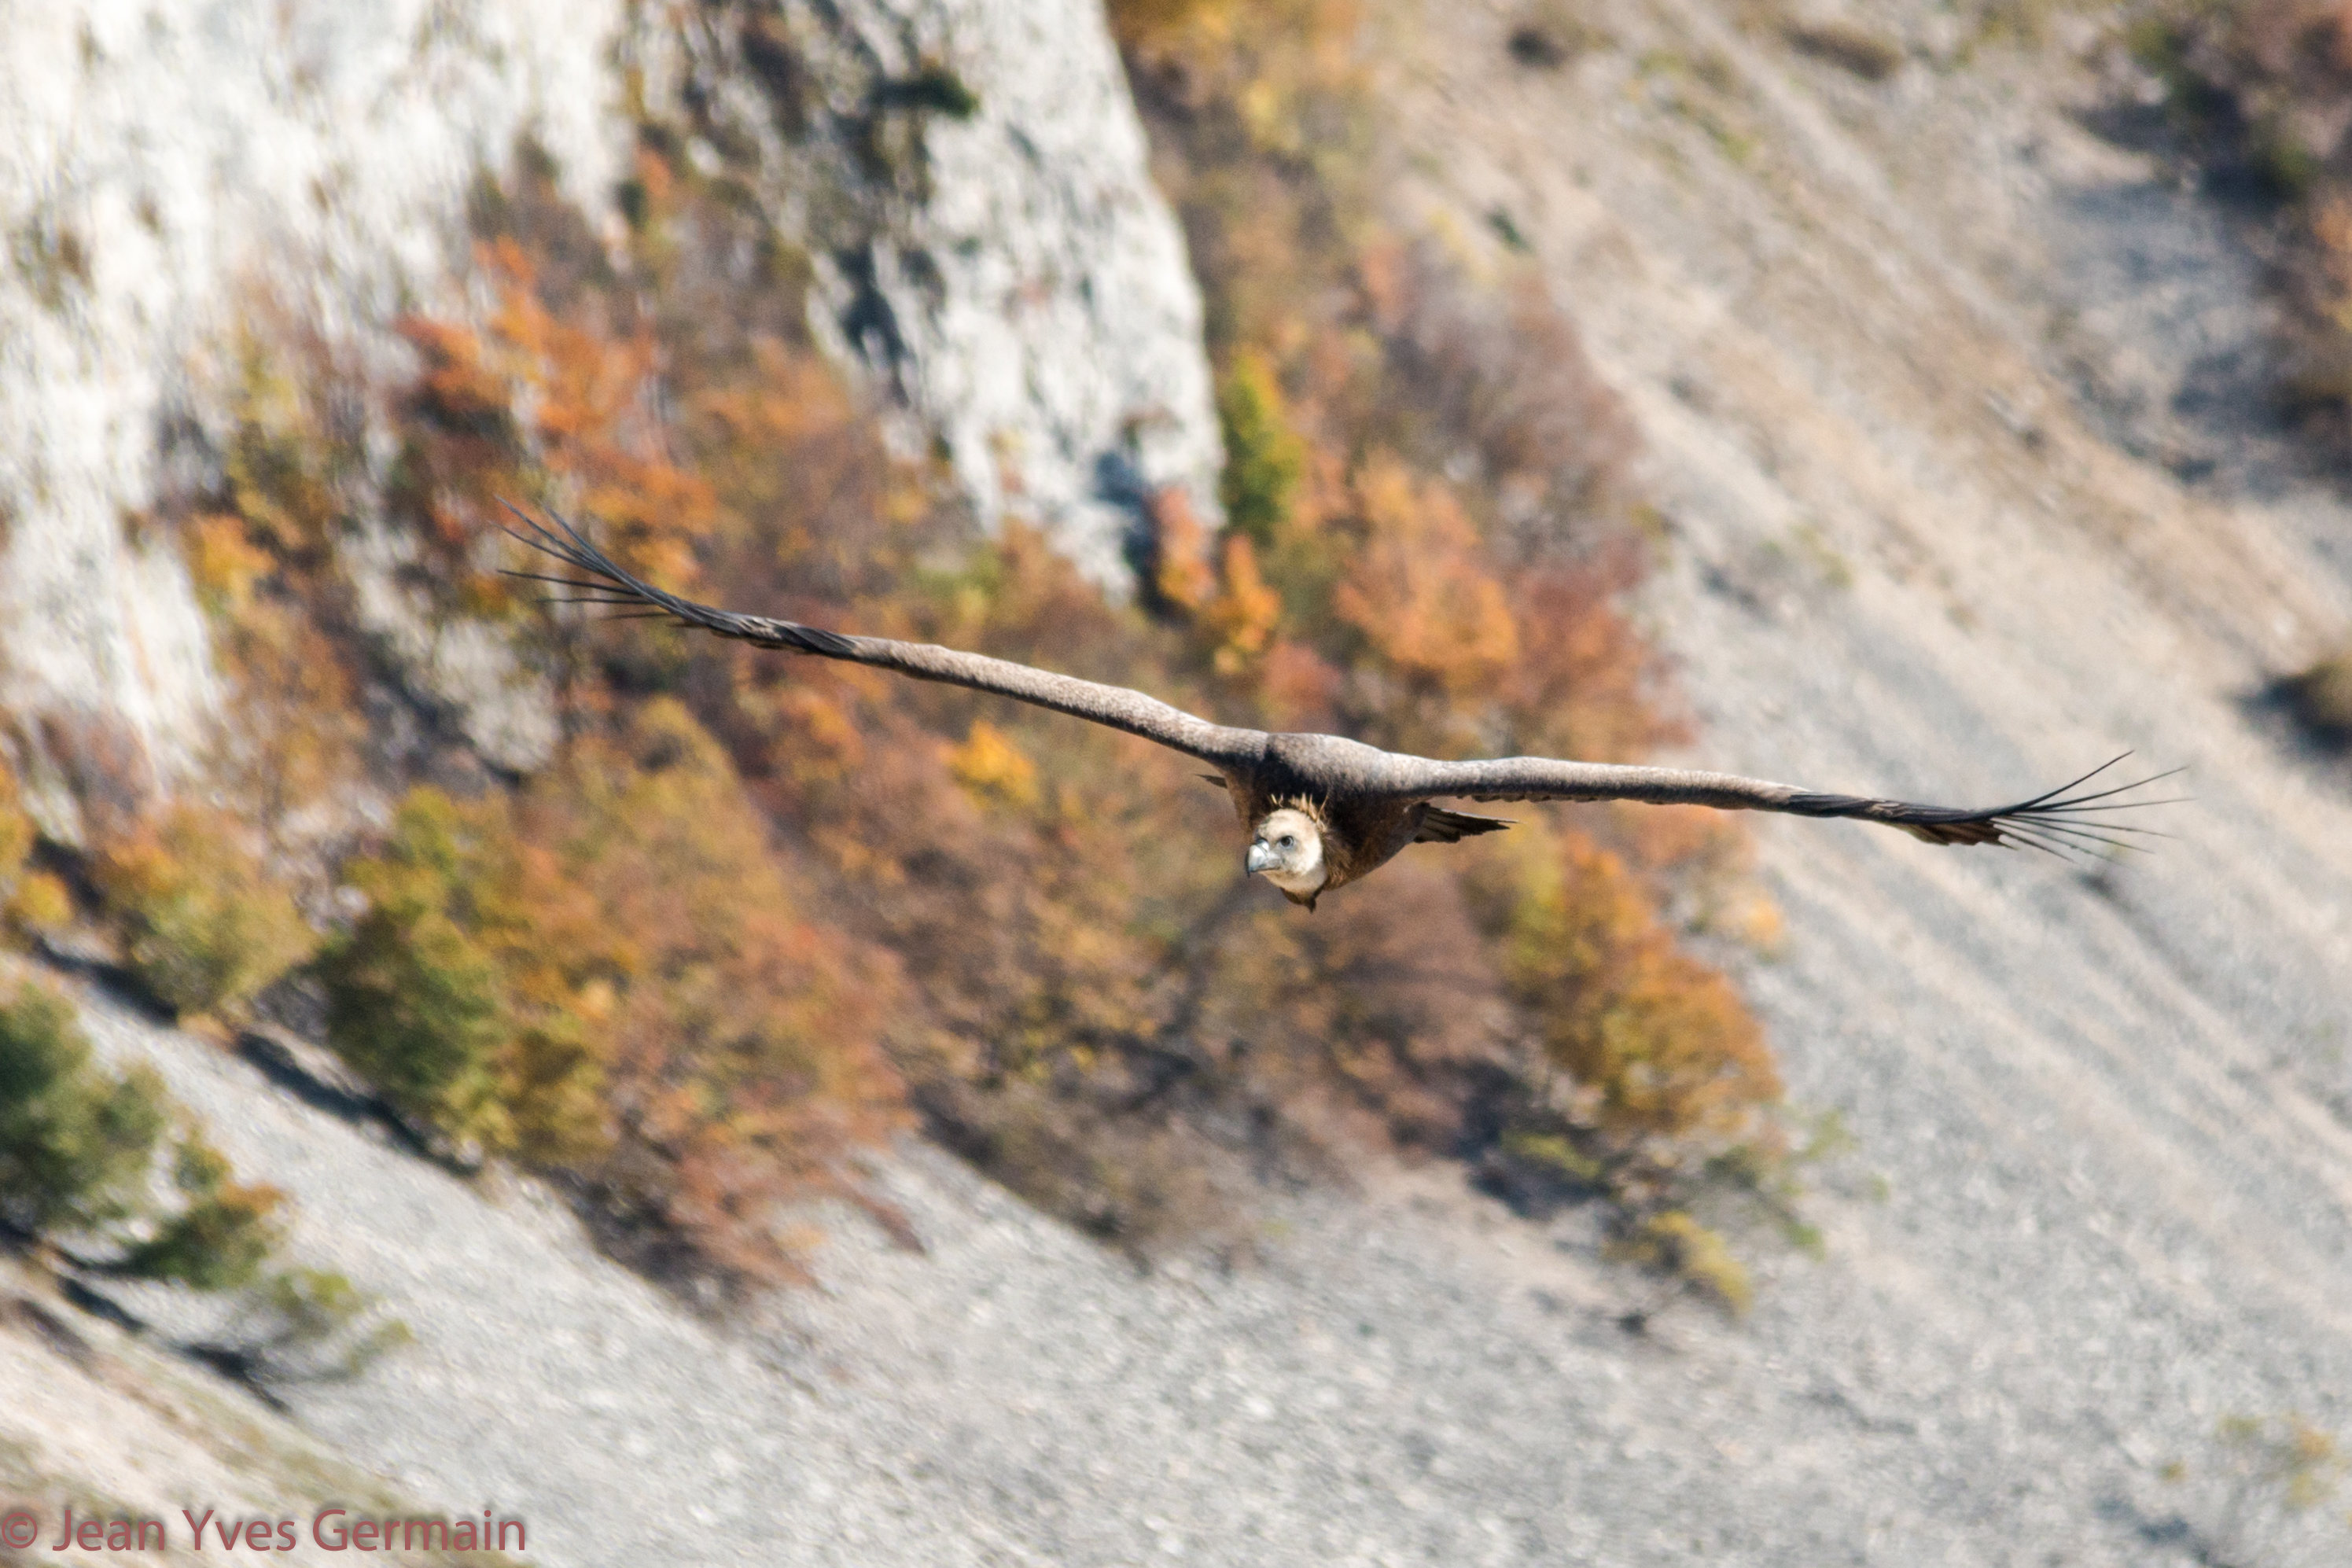 vautour iso 200 200mm 1-800 f-6.3